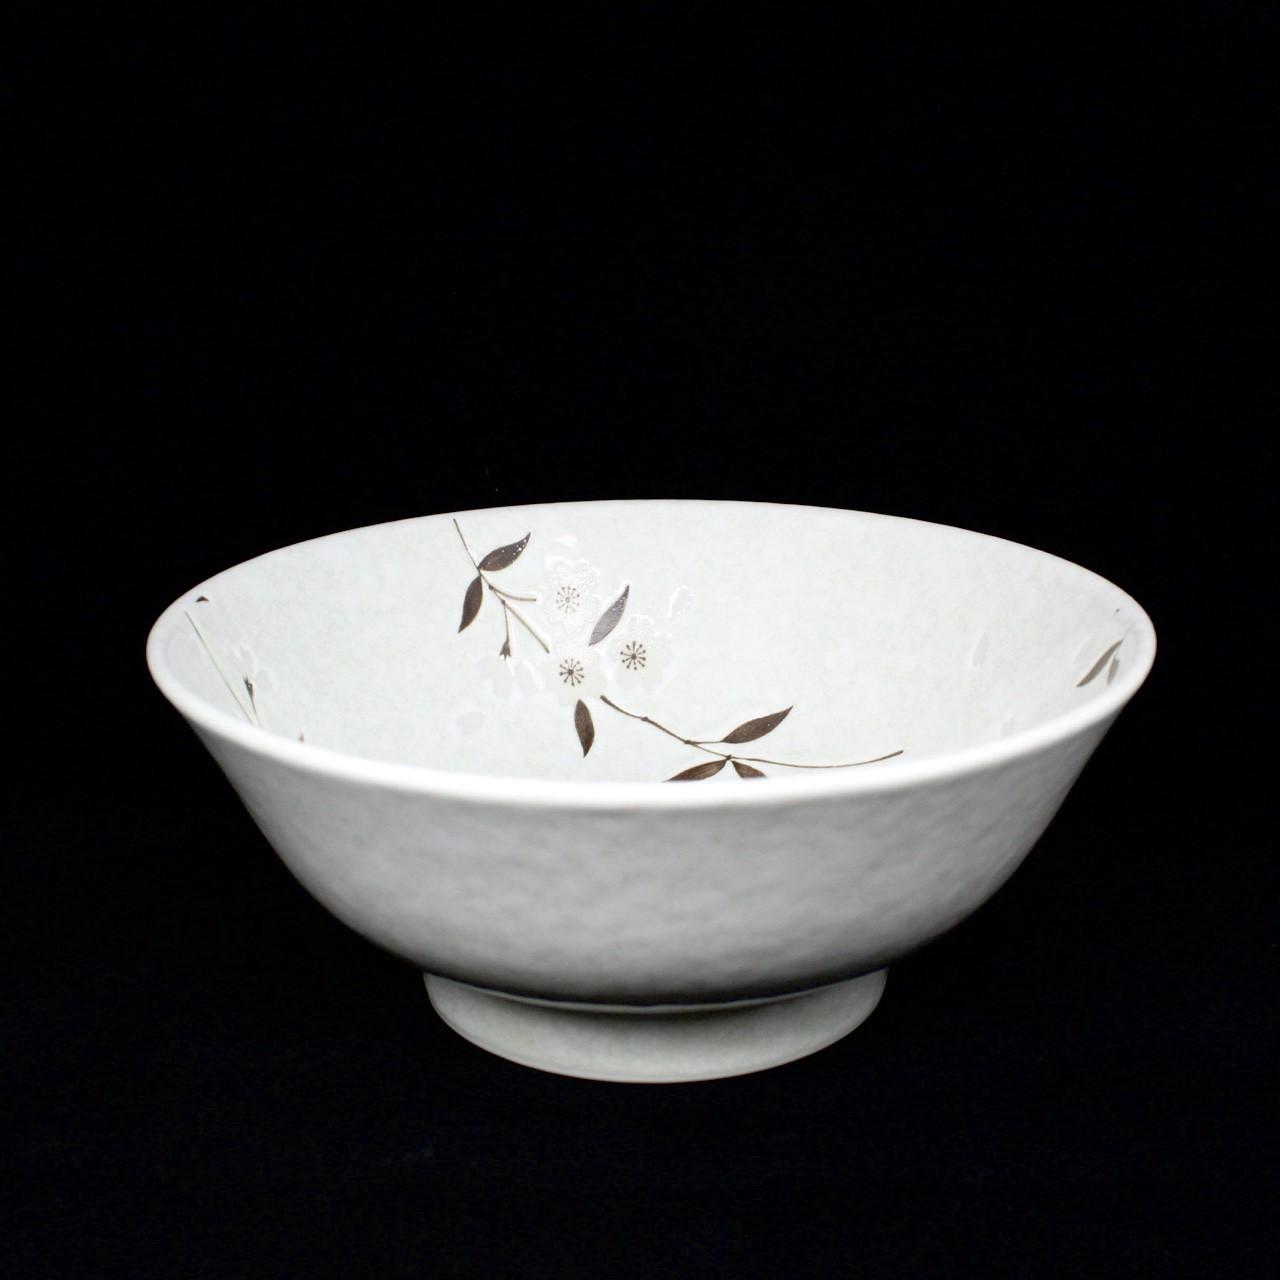 SHIRAYUKI SAKURA TIGELA PARA SOPA 21X8.5cm 734g